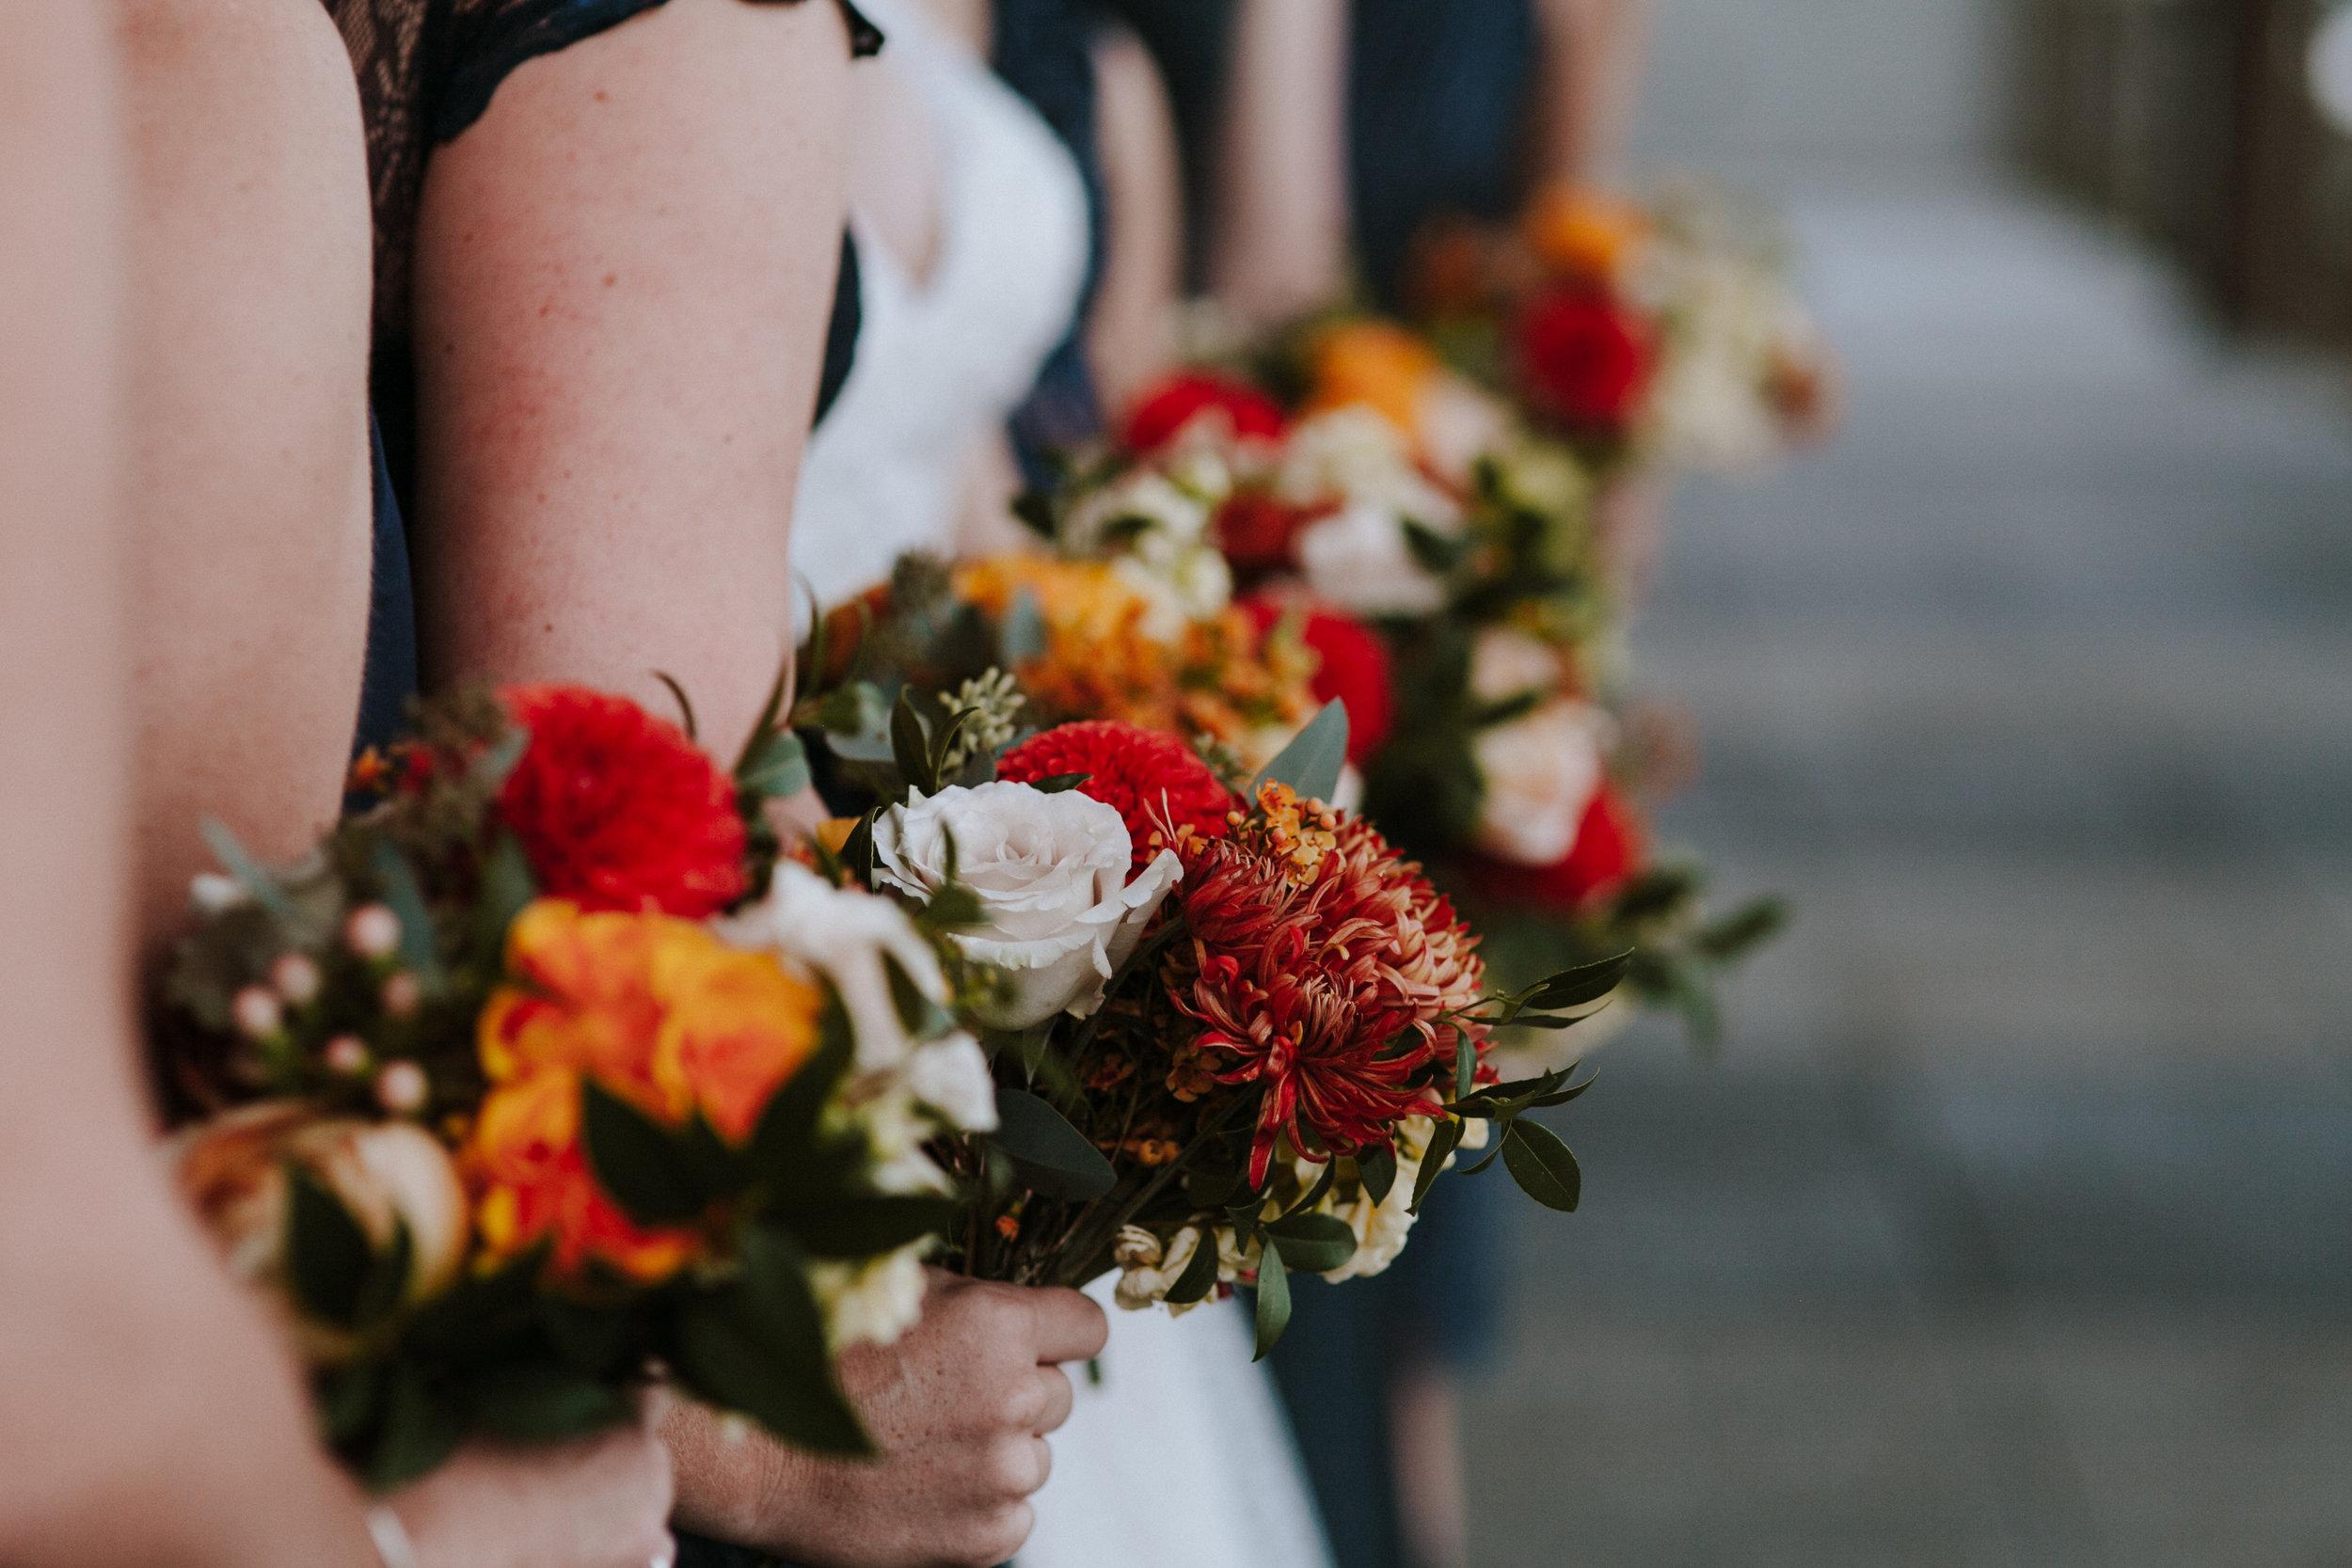 wedding bouquets red, yellow, orange, berries roses